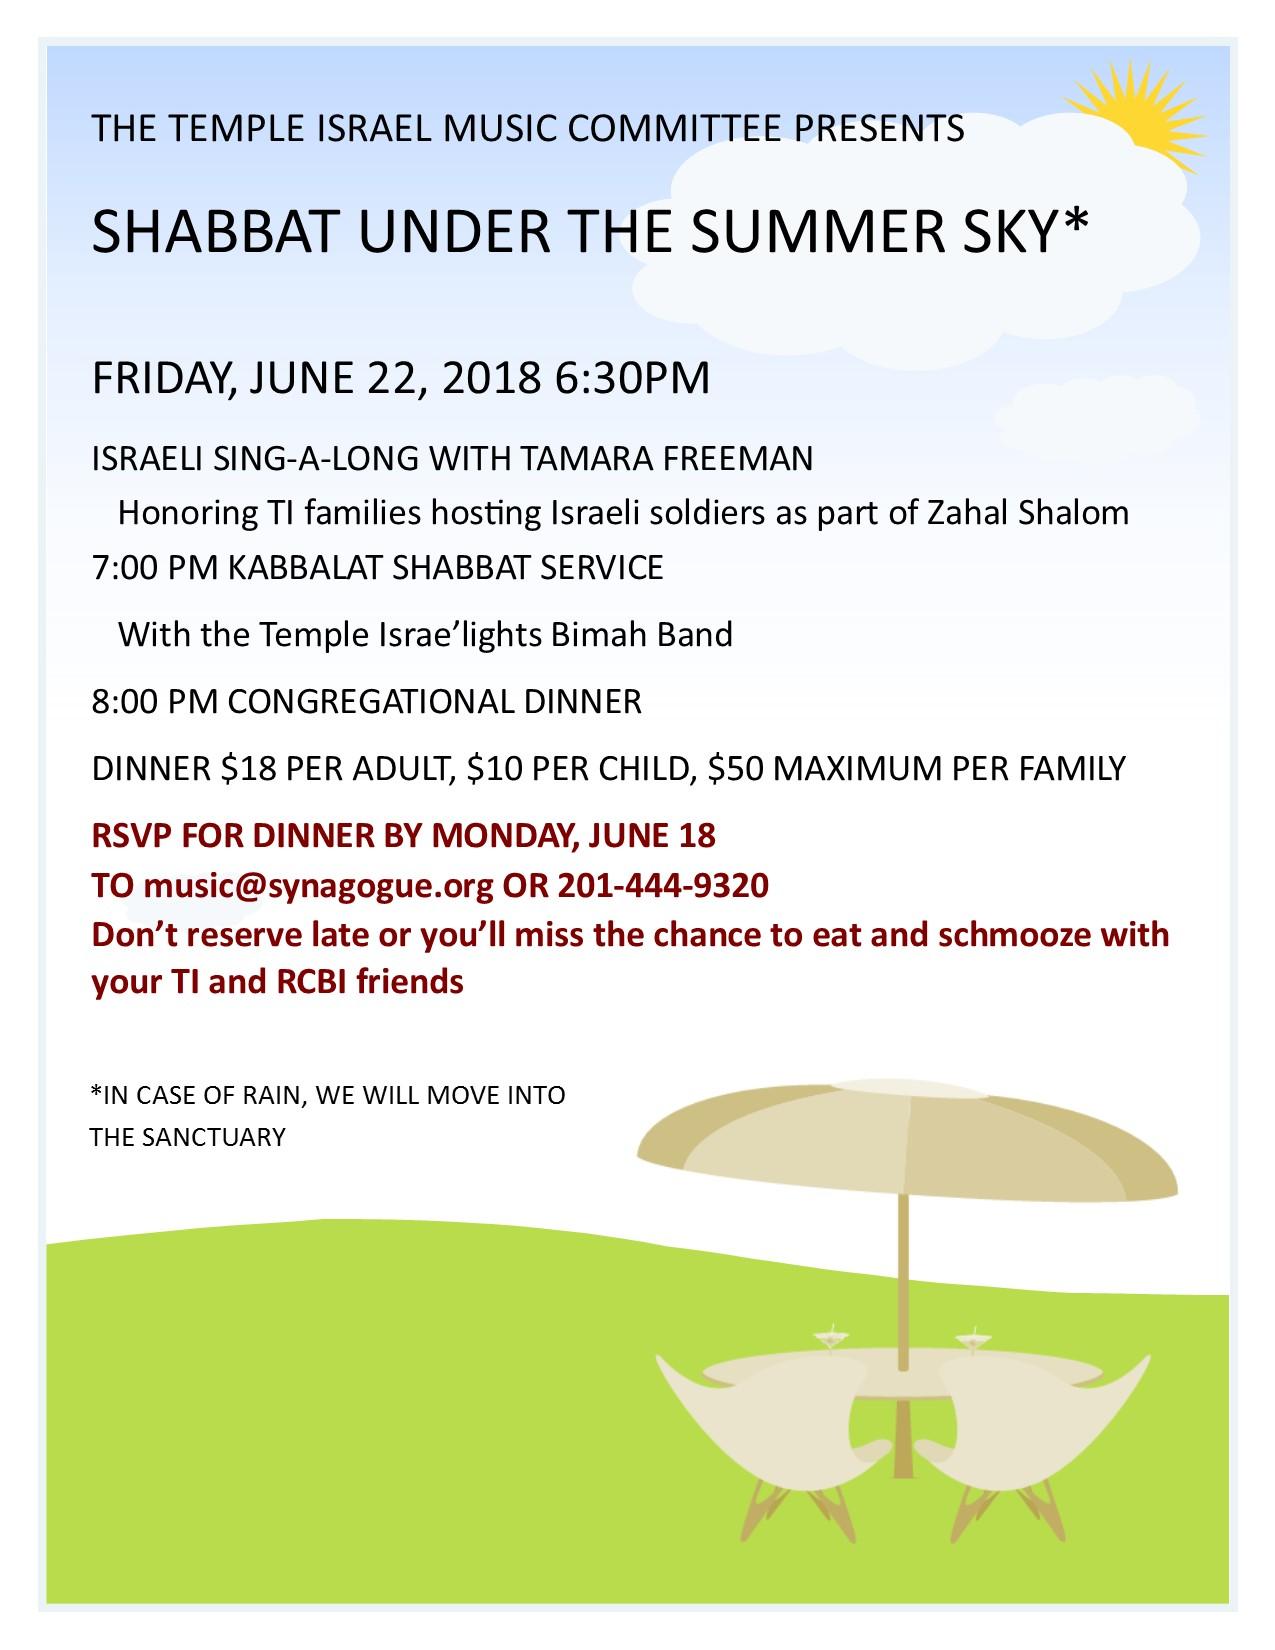 Shabbat Under the Summer Sky/dinner